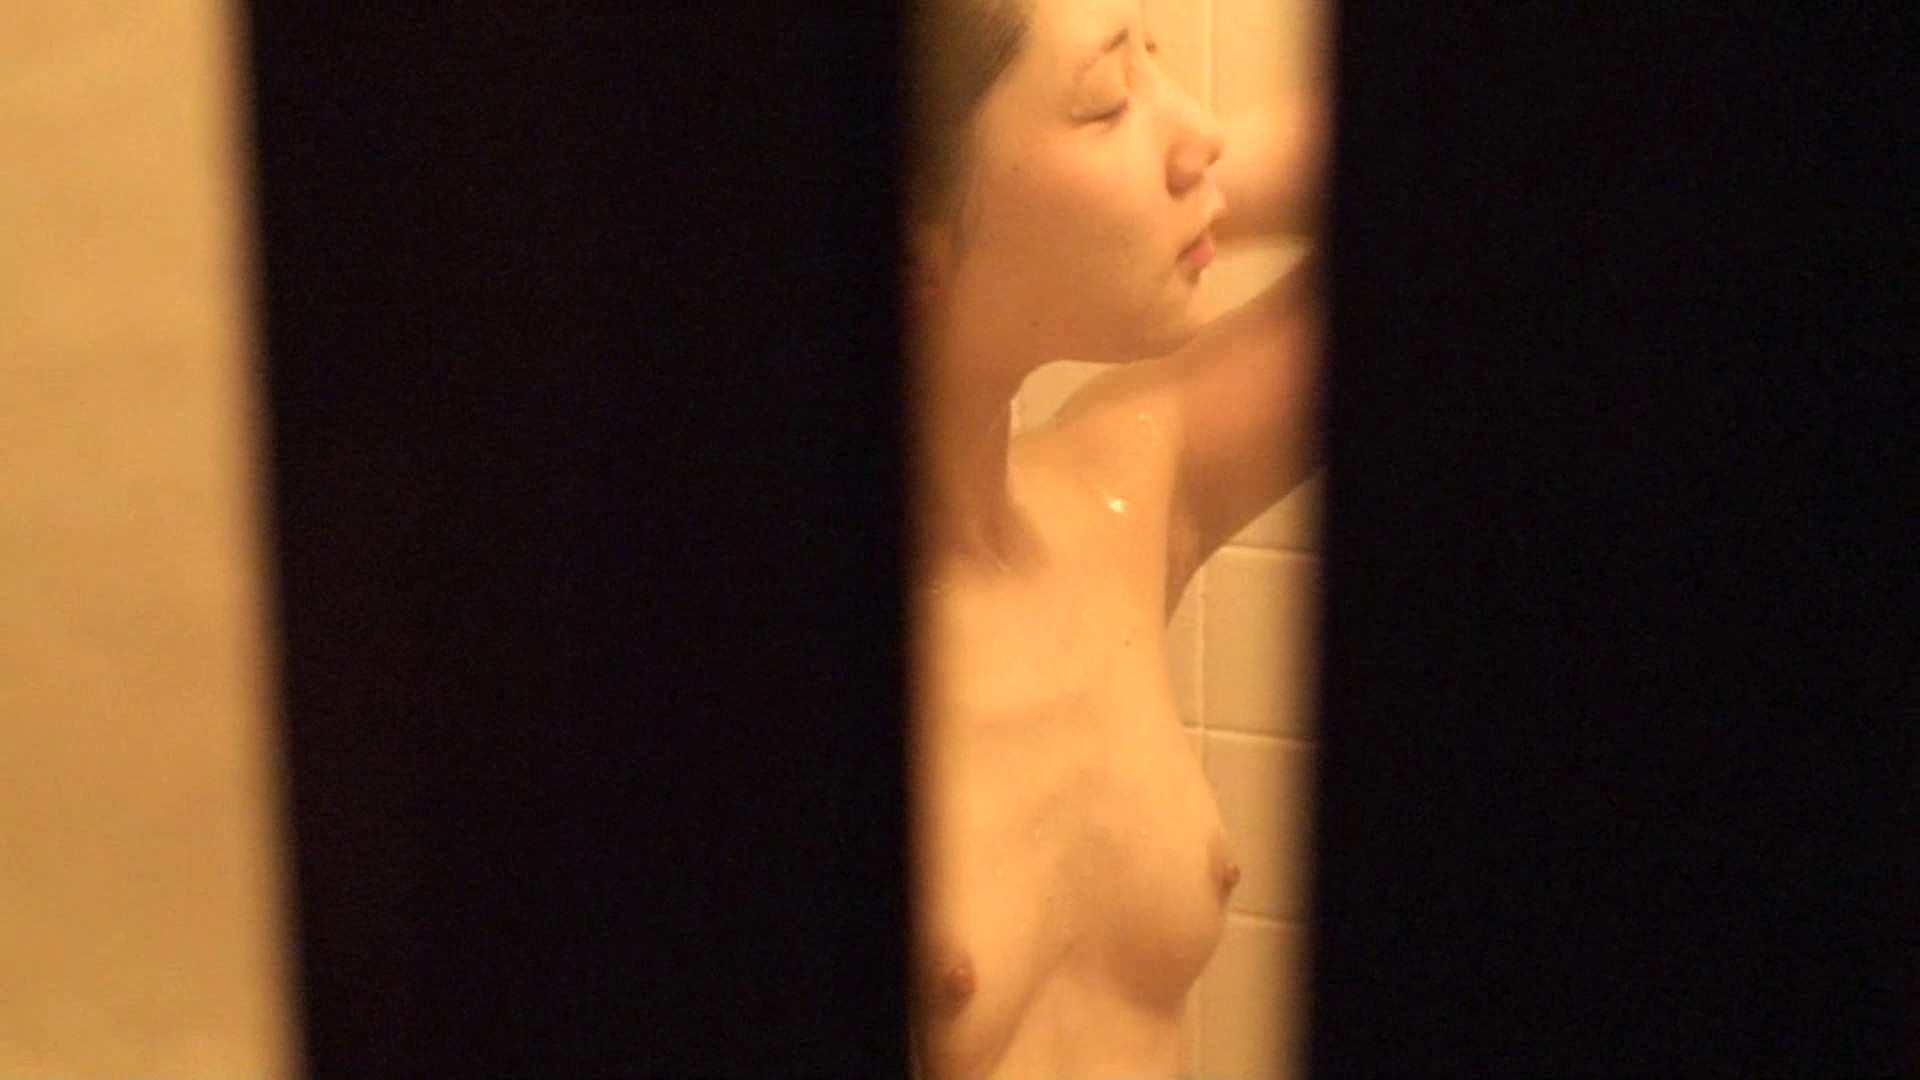 vol.02超可愛すぎる彼女の裸体をハイビジョンで!至近距離での眺め最高! 民家  75枚 49